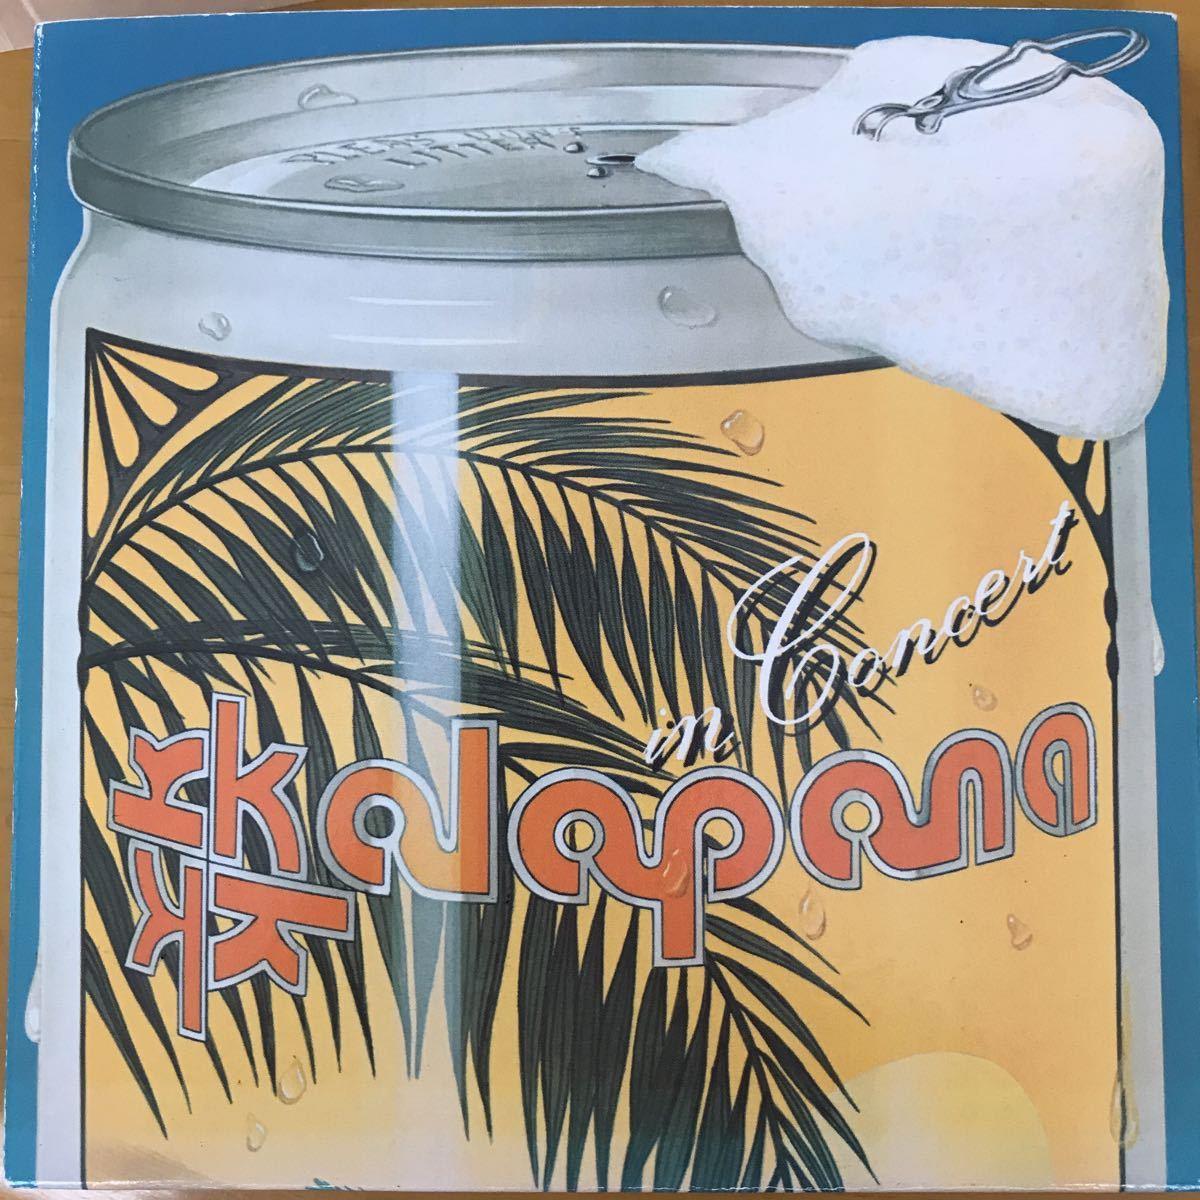 KALAPANA IN CONCERT カラパナ 国内盤CD 2枚組_画像1